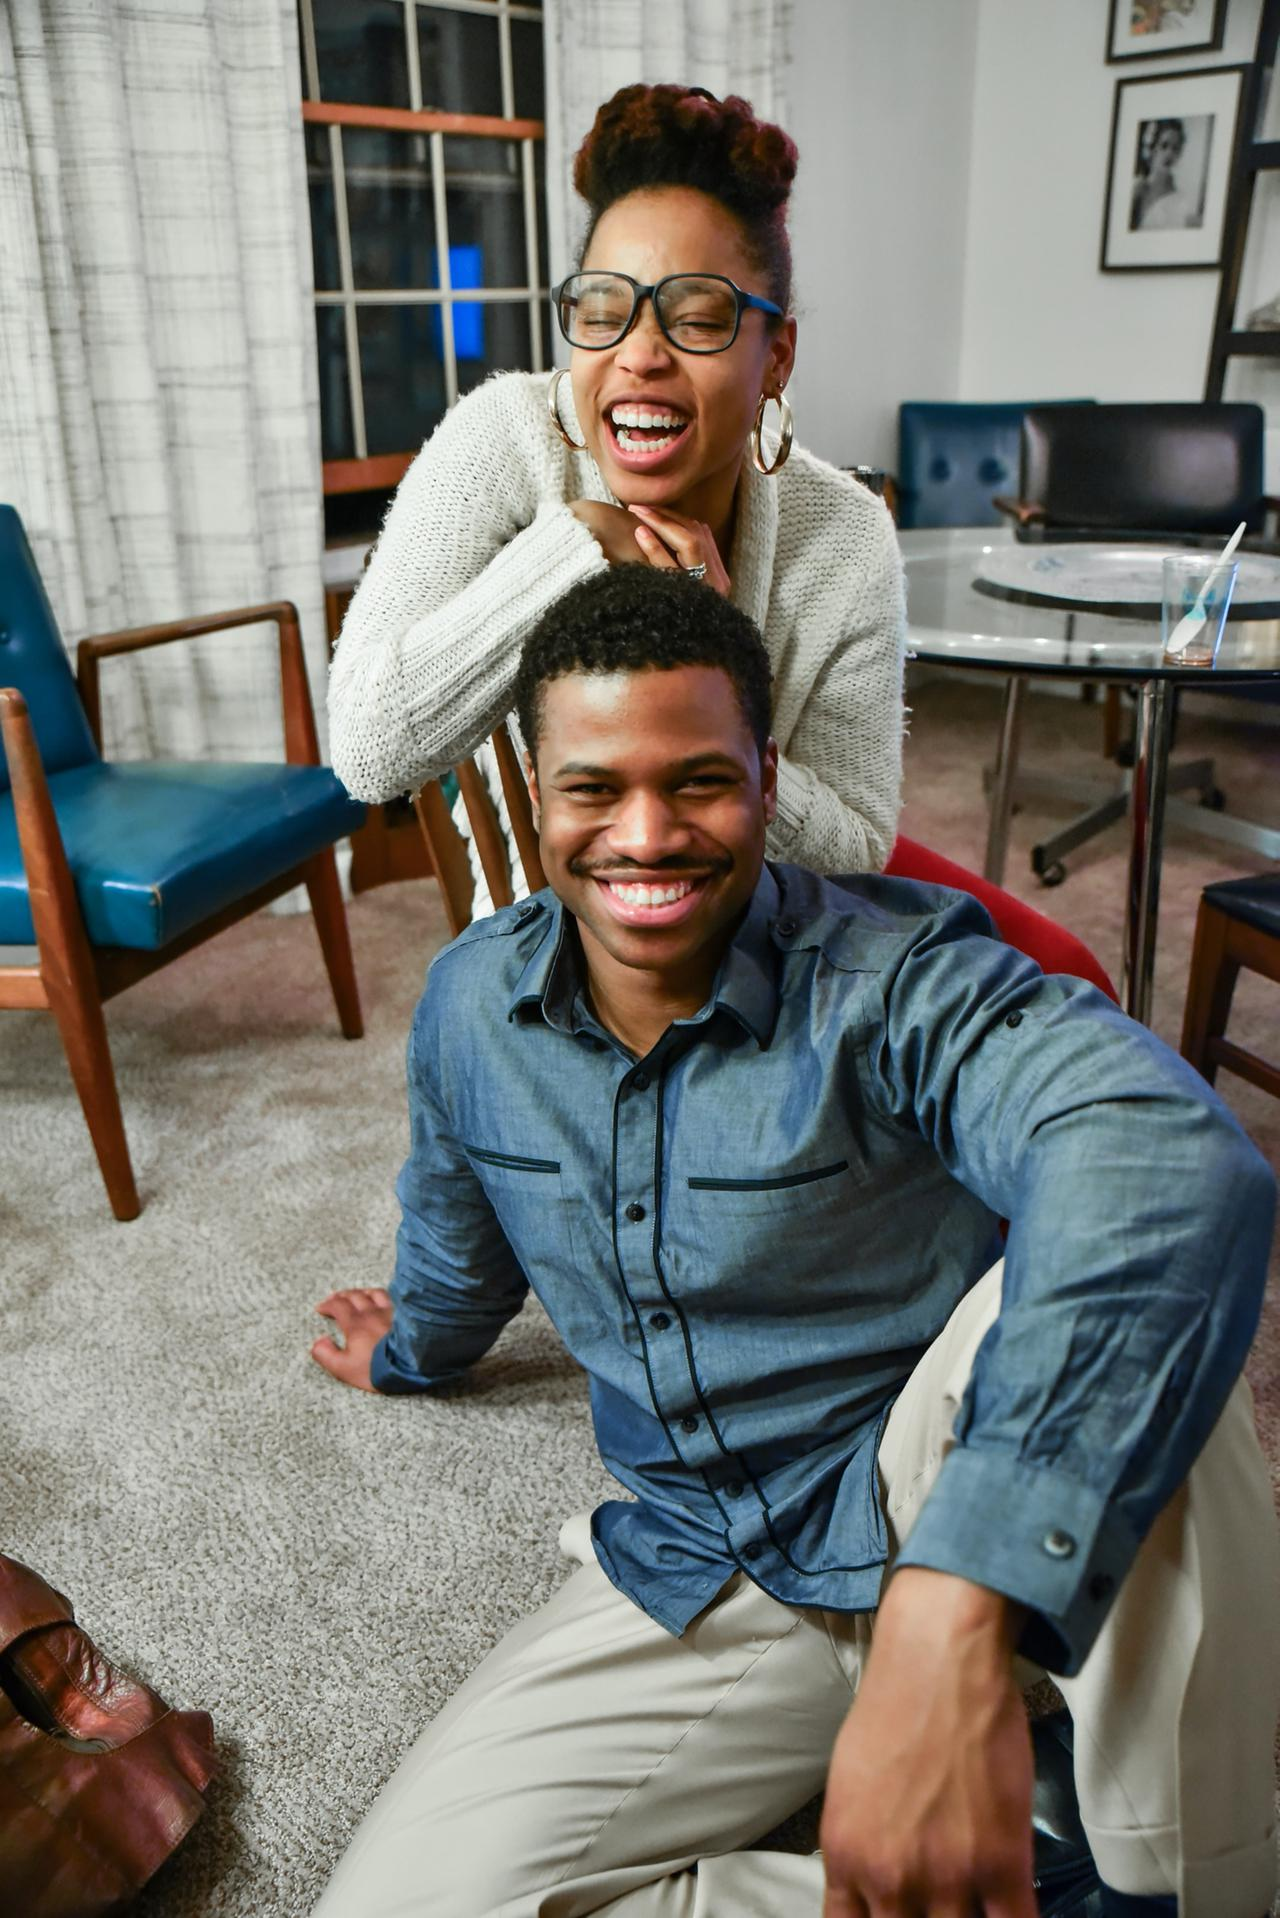 Homeowners Insurance gleetopia